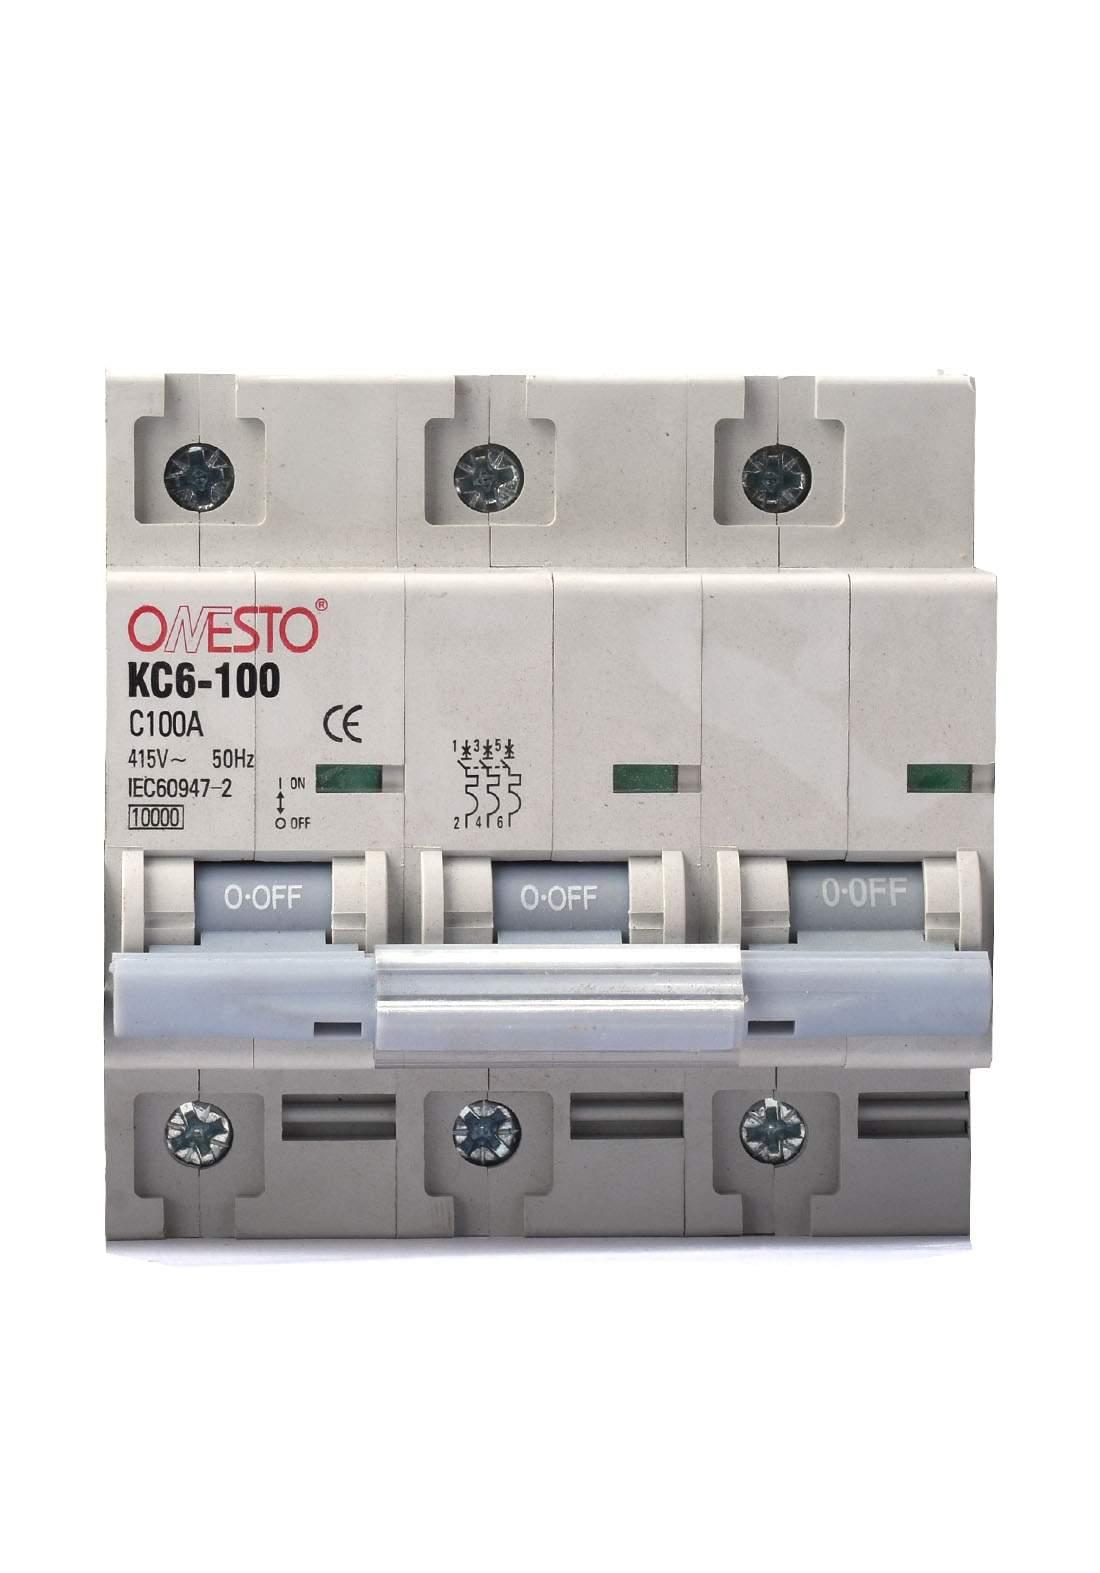 Raja Circuit Breaker 100 A قاطع تيار الكهرباء (جوزة)